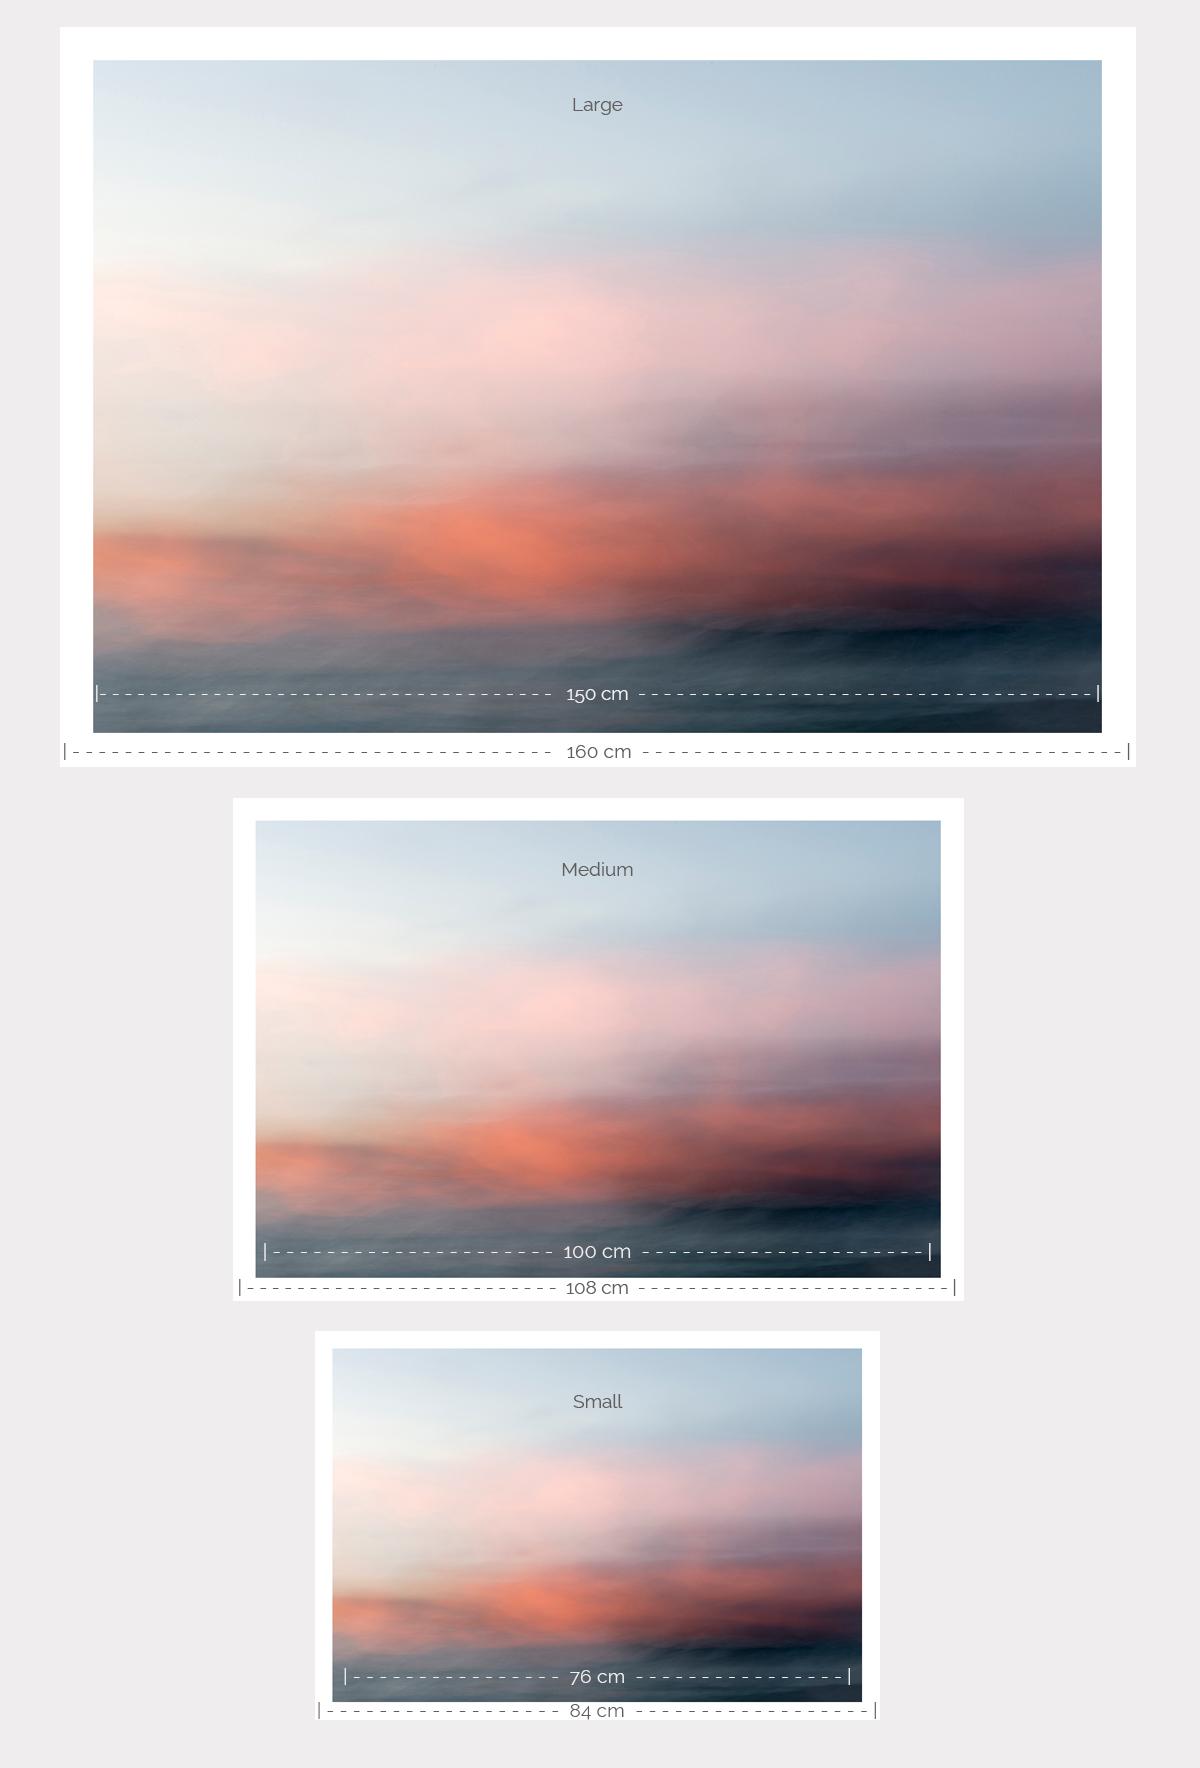 is-joanne-piechota-wholehearted-photographic-art